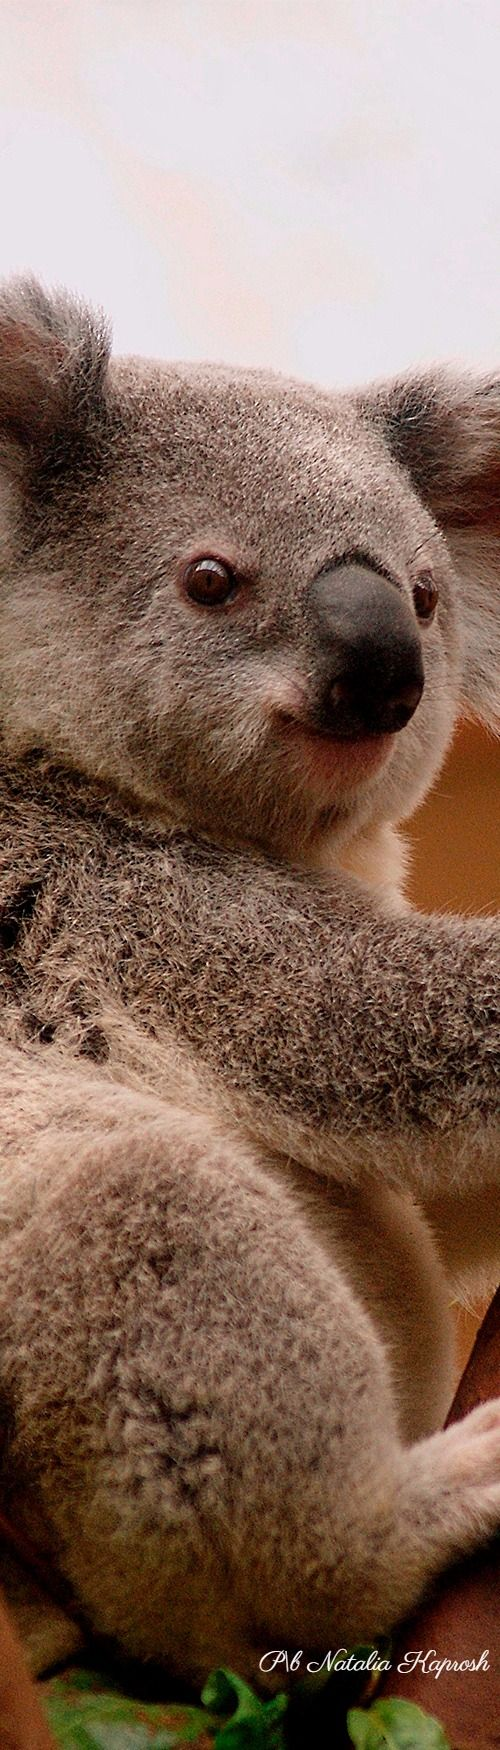 Nature Of Australia Koala